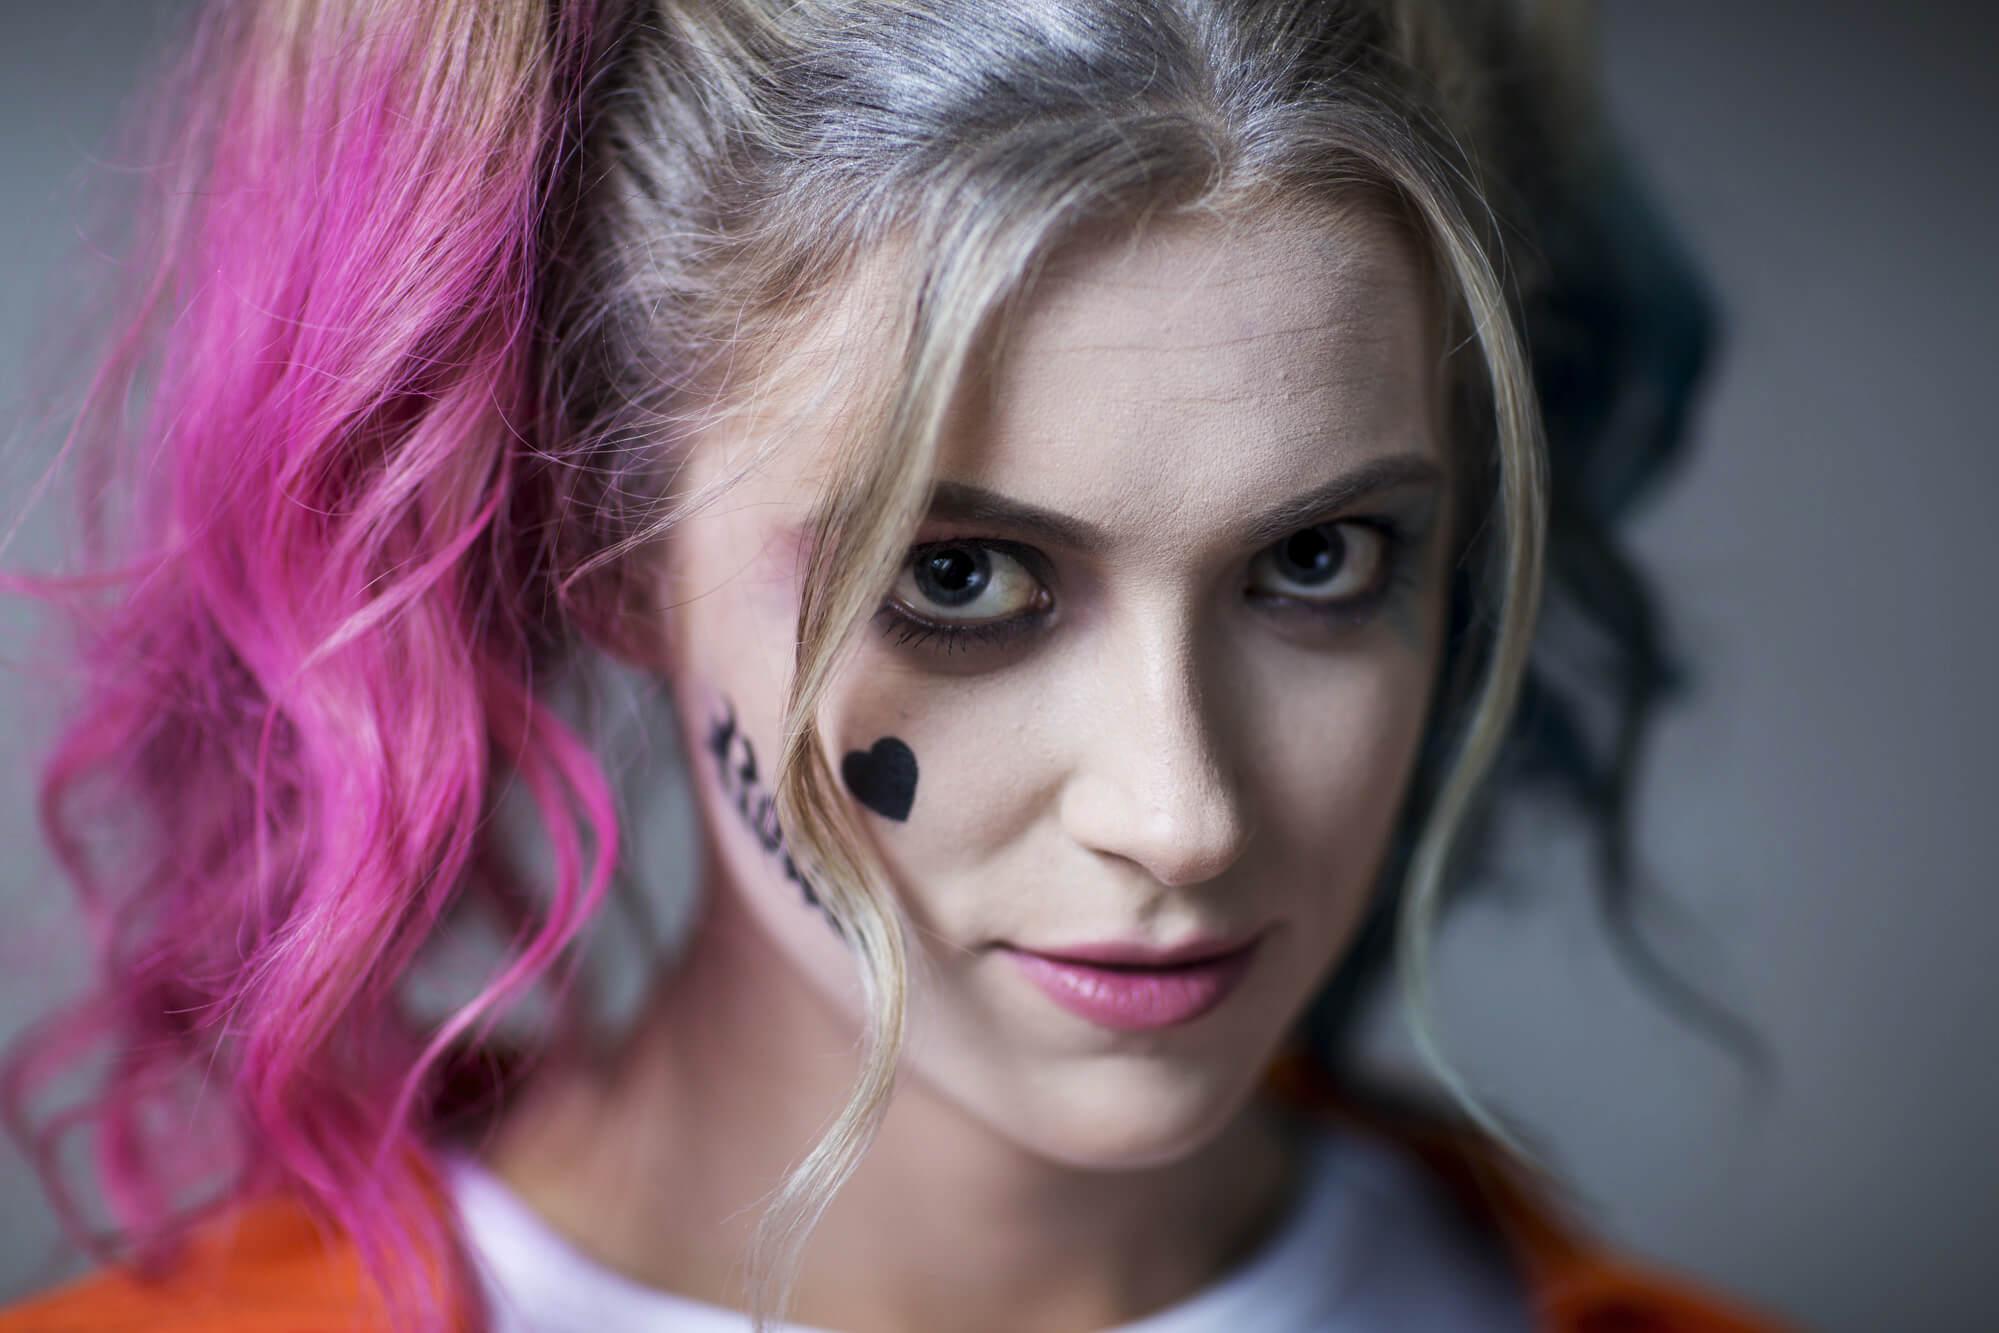 DIY Harley Quinn Makeup Amp Hair Tutorial Suicide Squad Prison Jumpsuit Halloween Costumes Blog